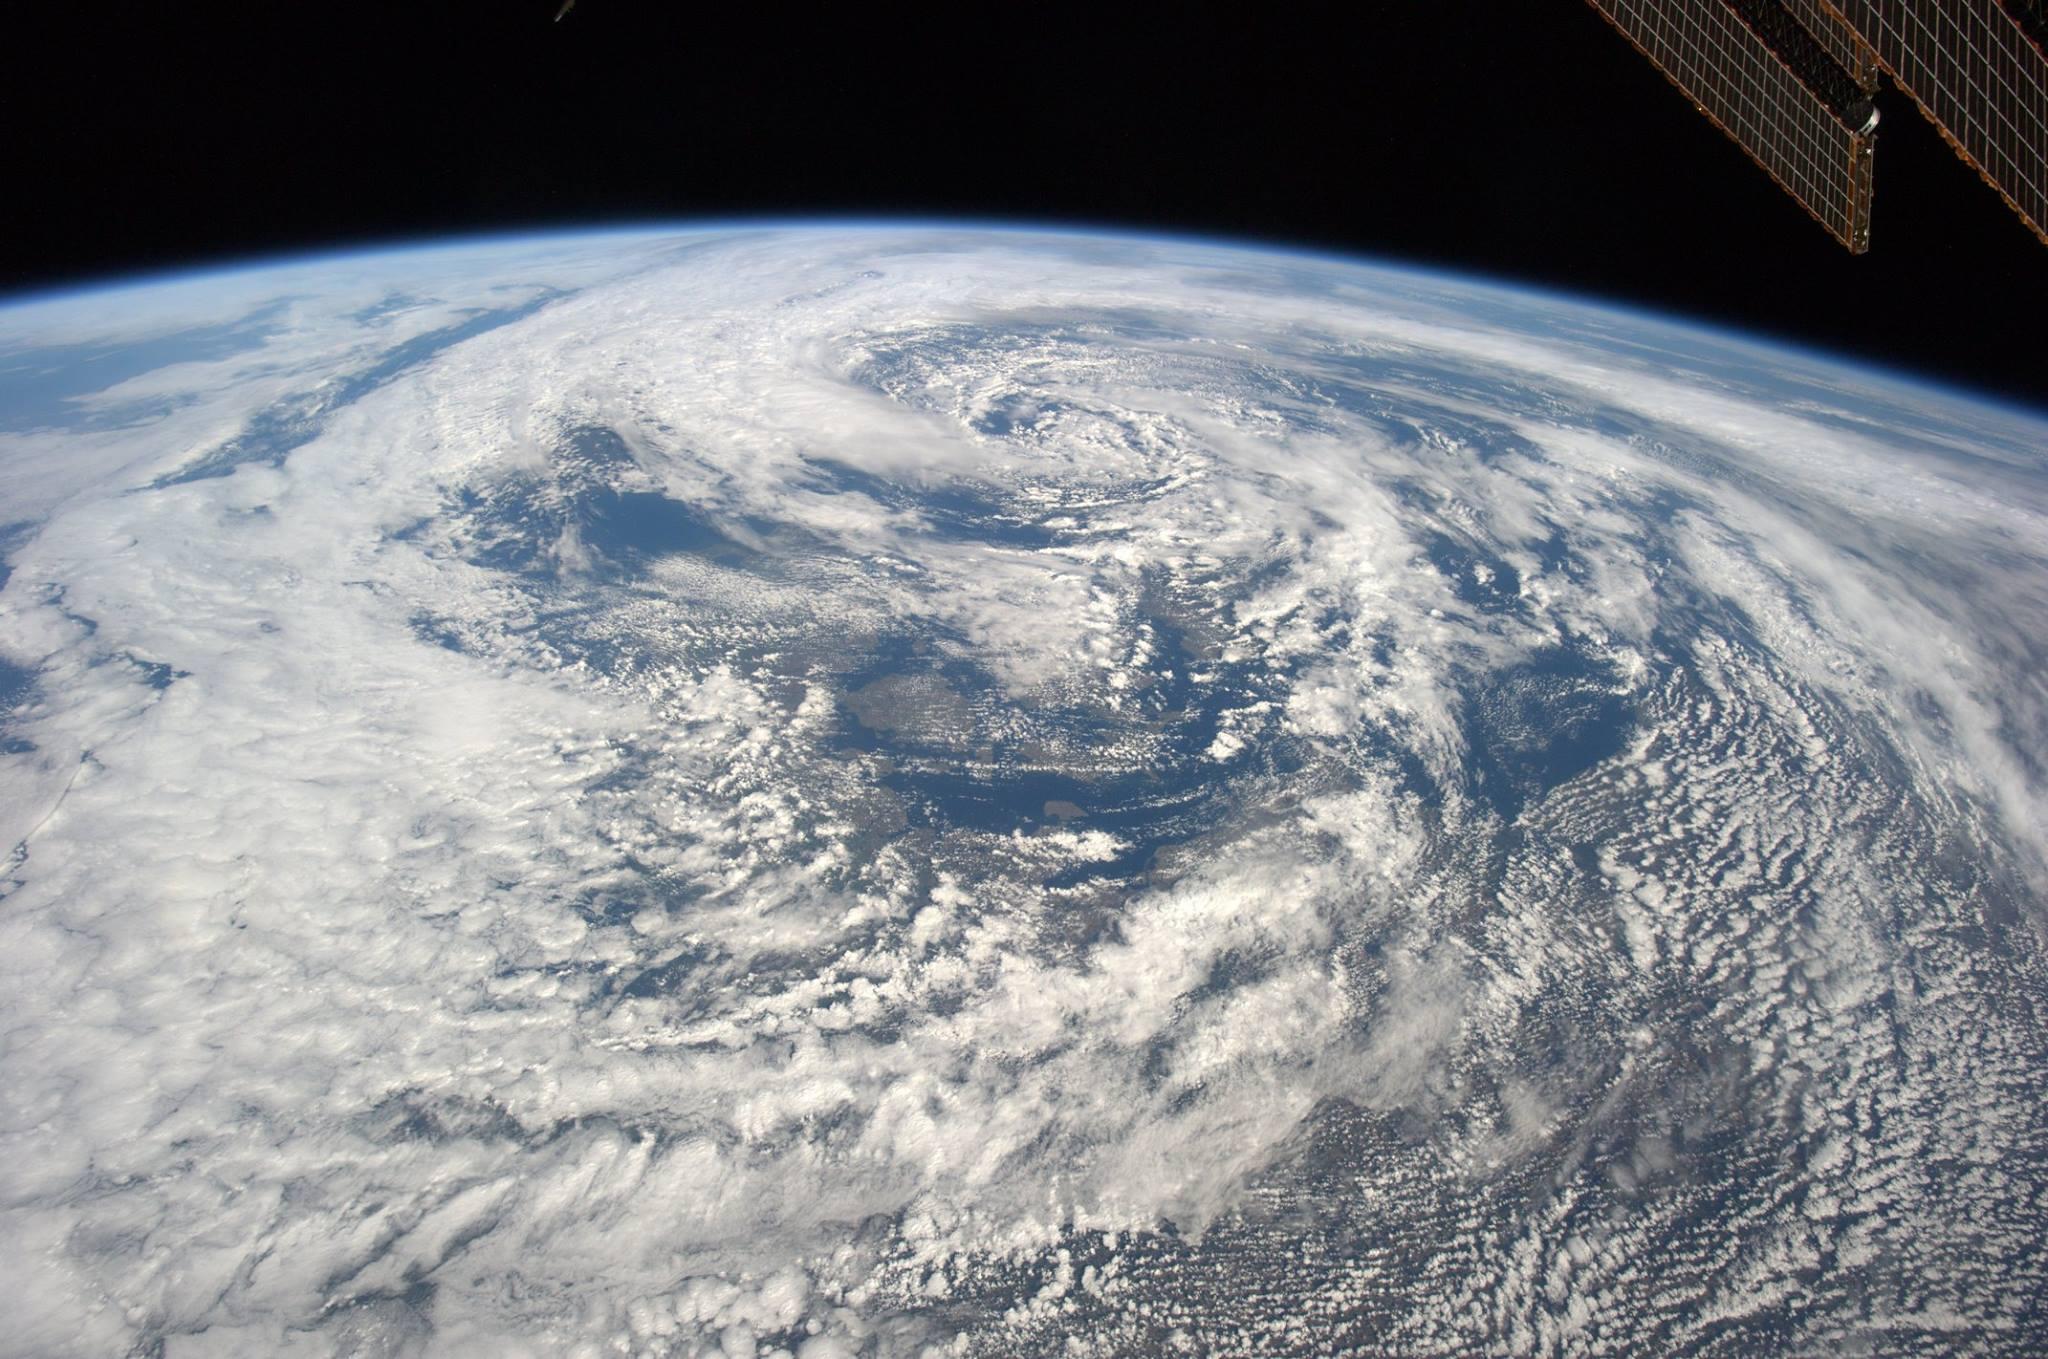 Photos astronaut Alexander Gerst 02